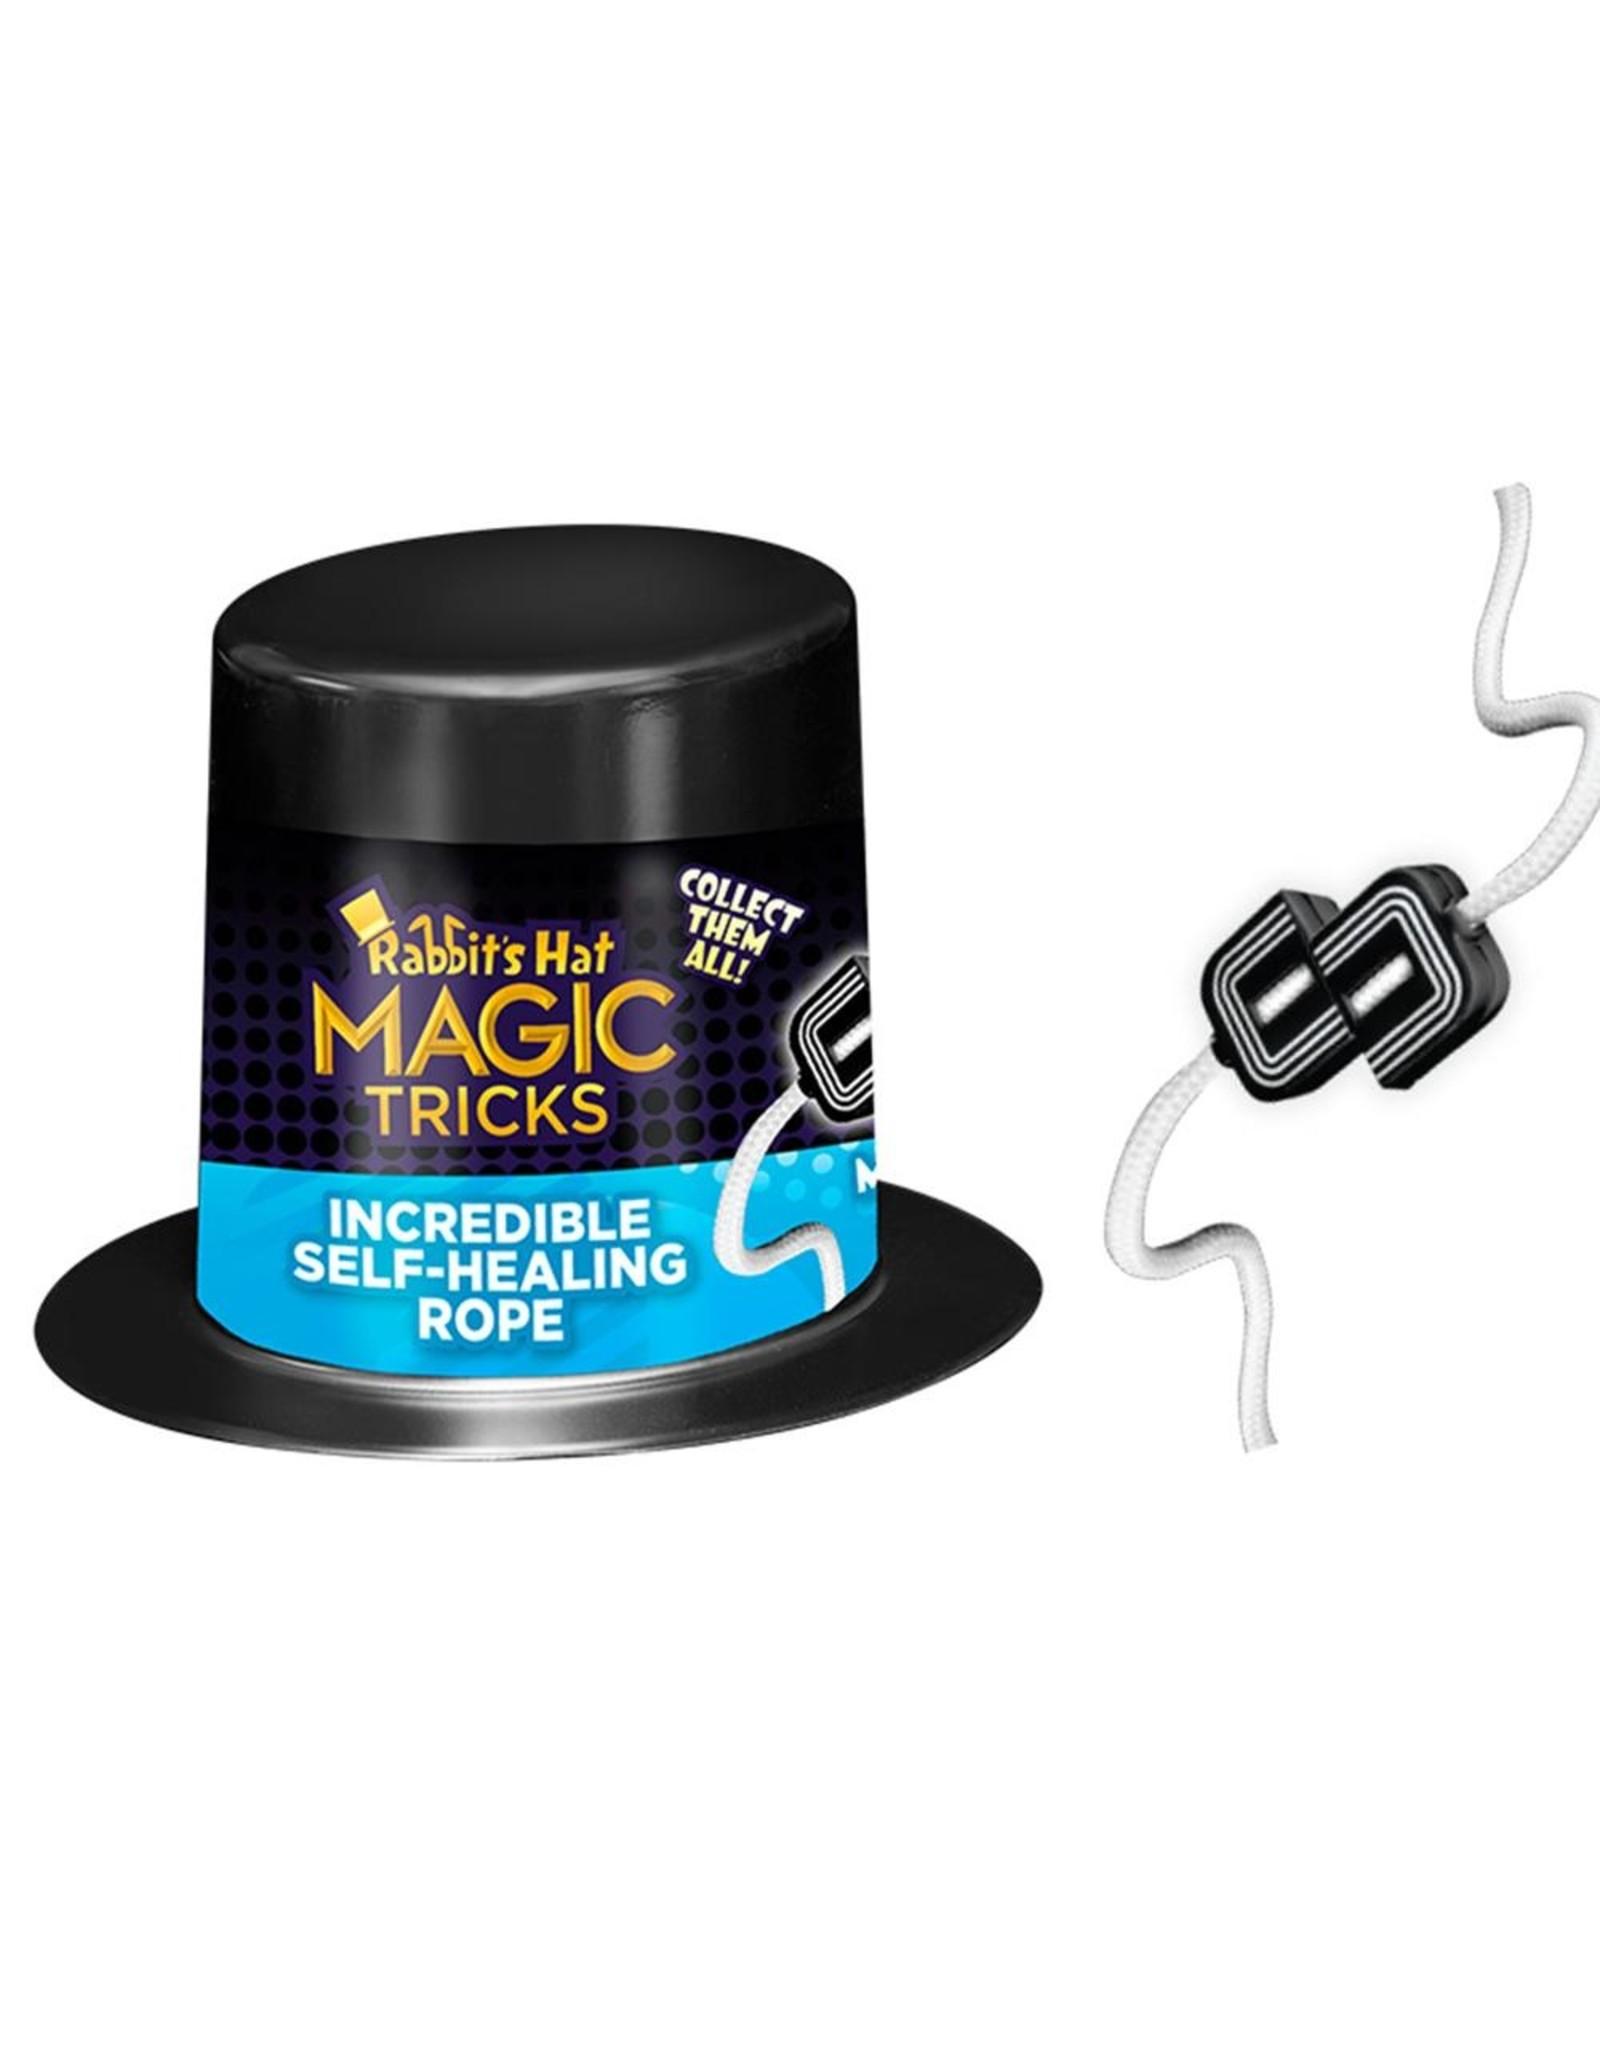 Thames & Kosmos Rabbit's Hat Magic Tricks